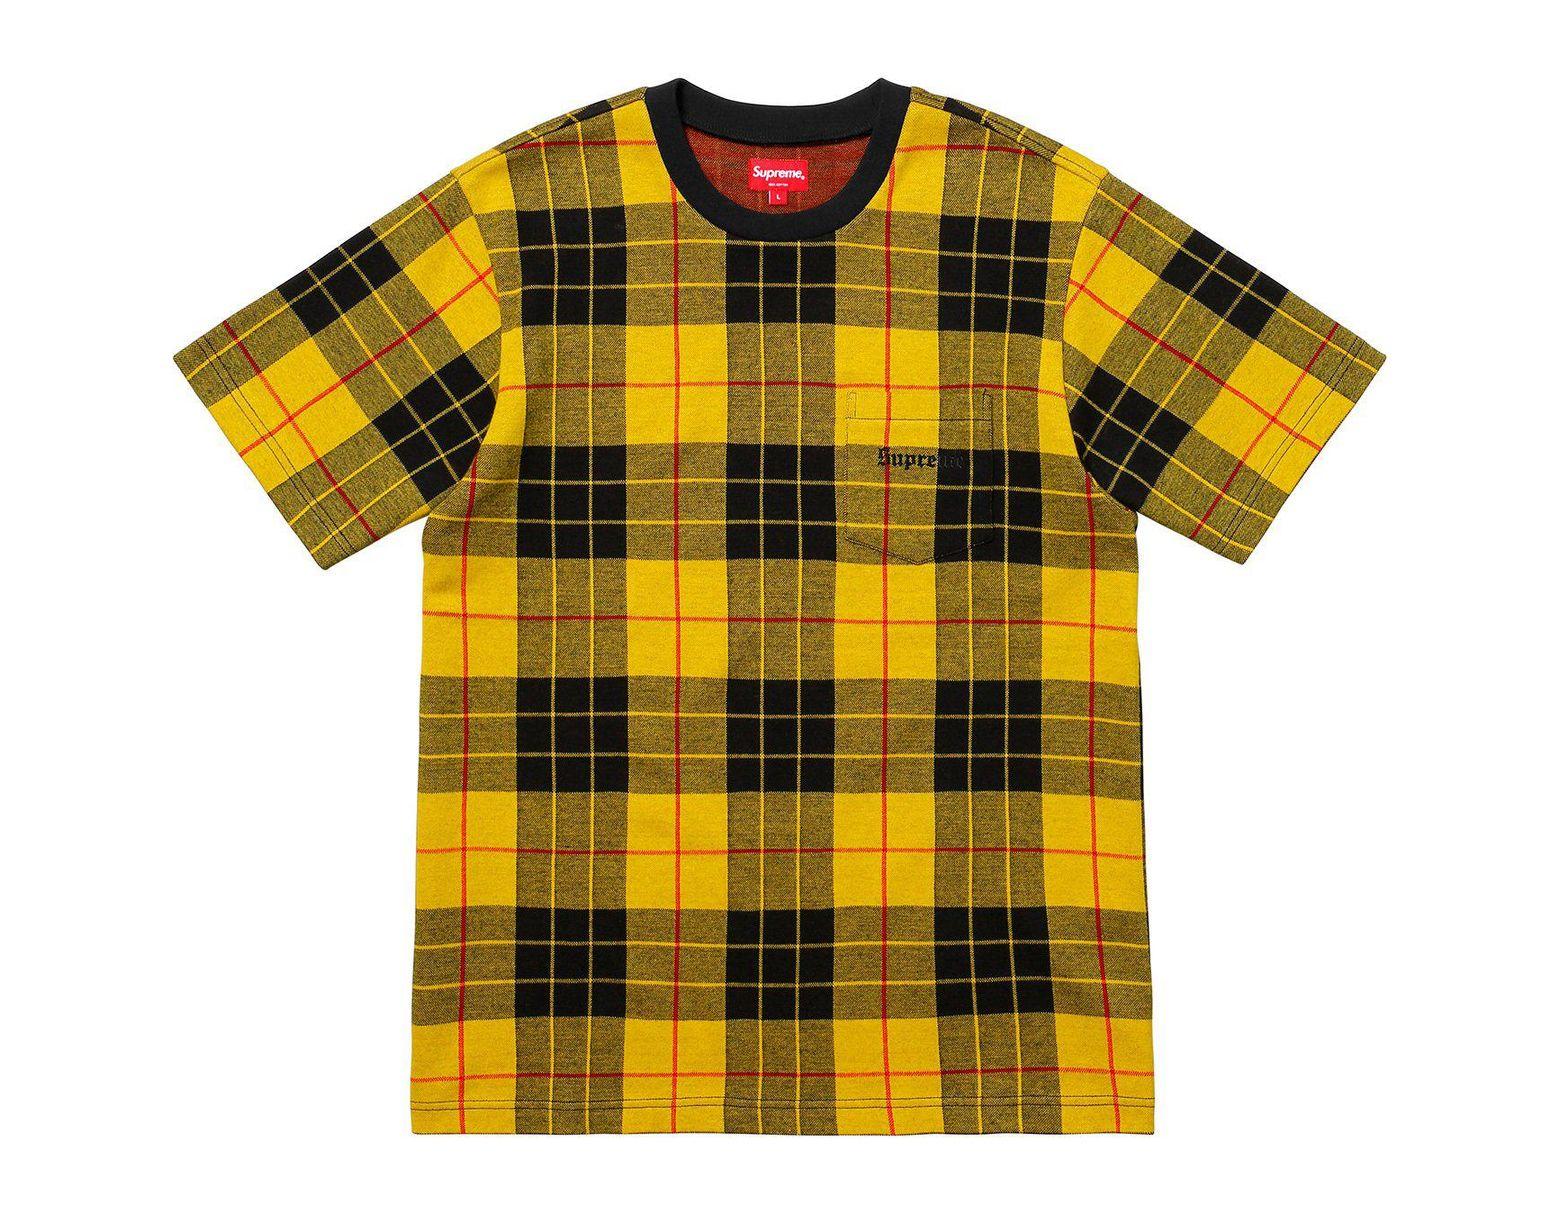 3ec9ddb1cb95 Supreme Jacquard Tartan Plaid Pocket Tee Yellow in Yellow for Men - Lyst